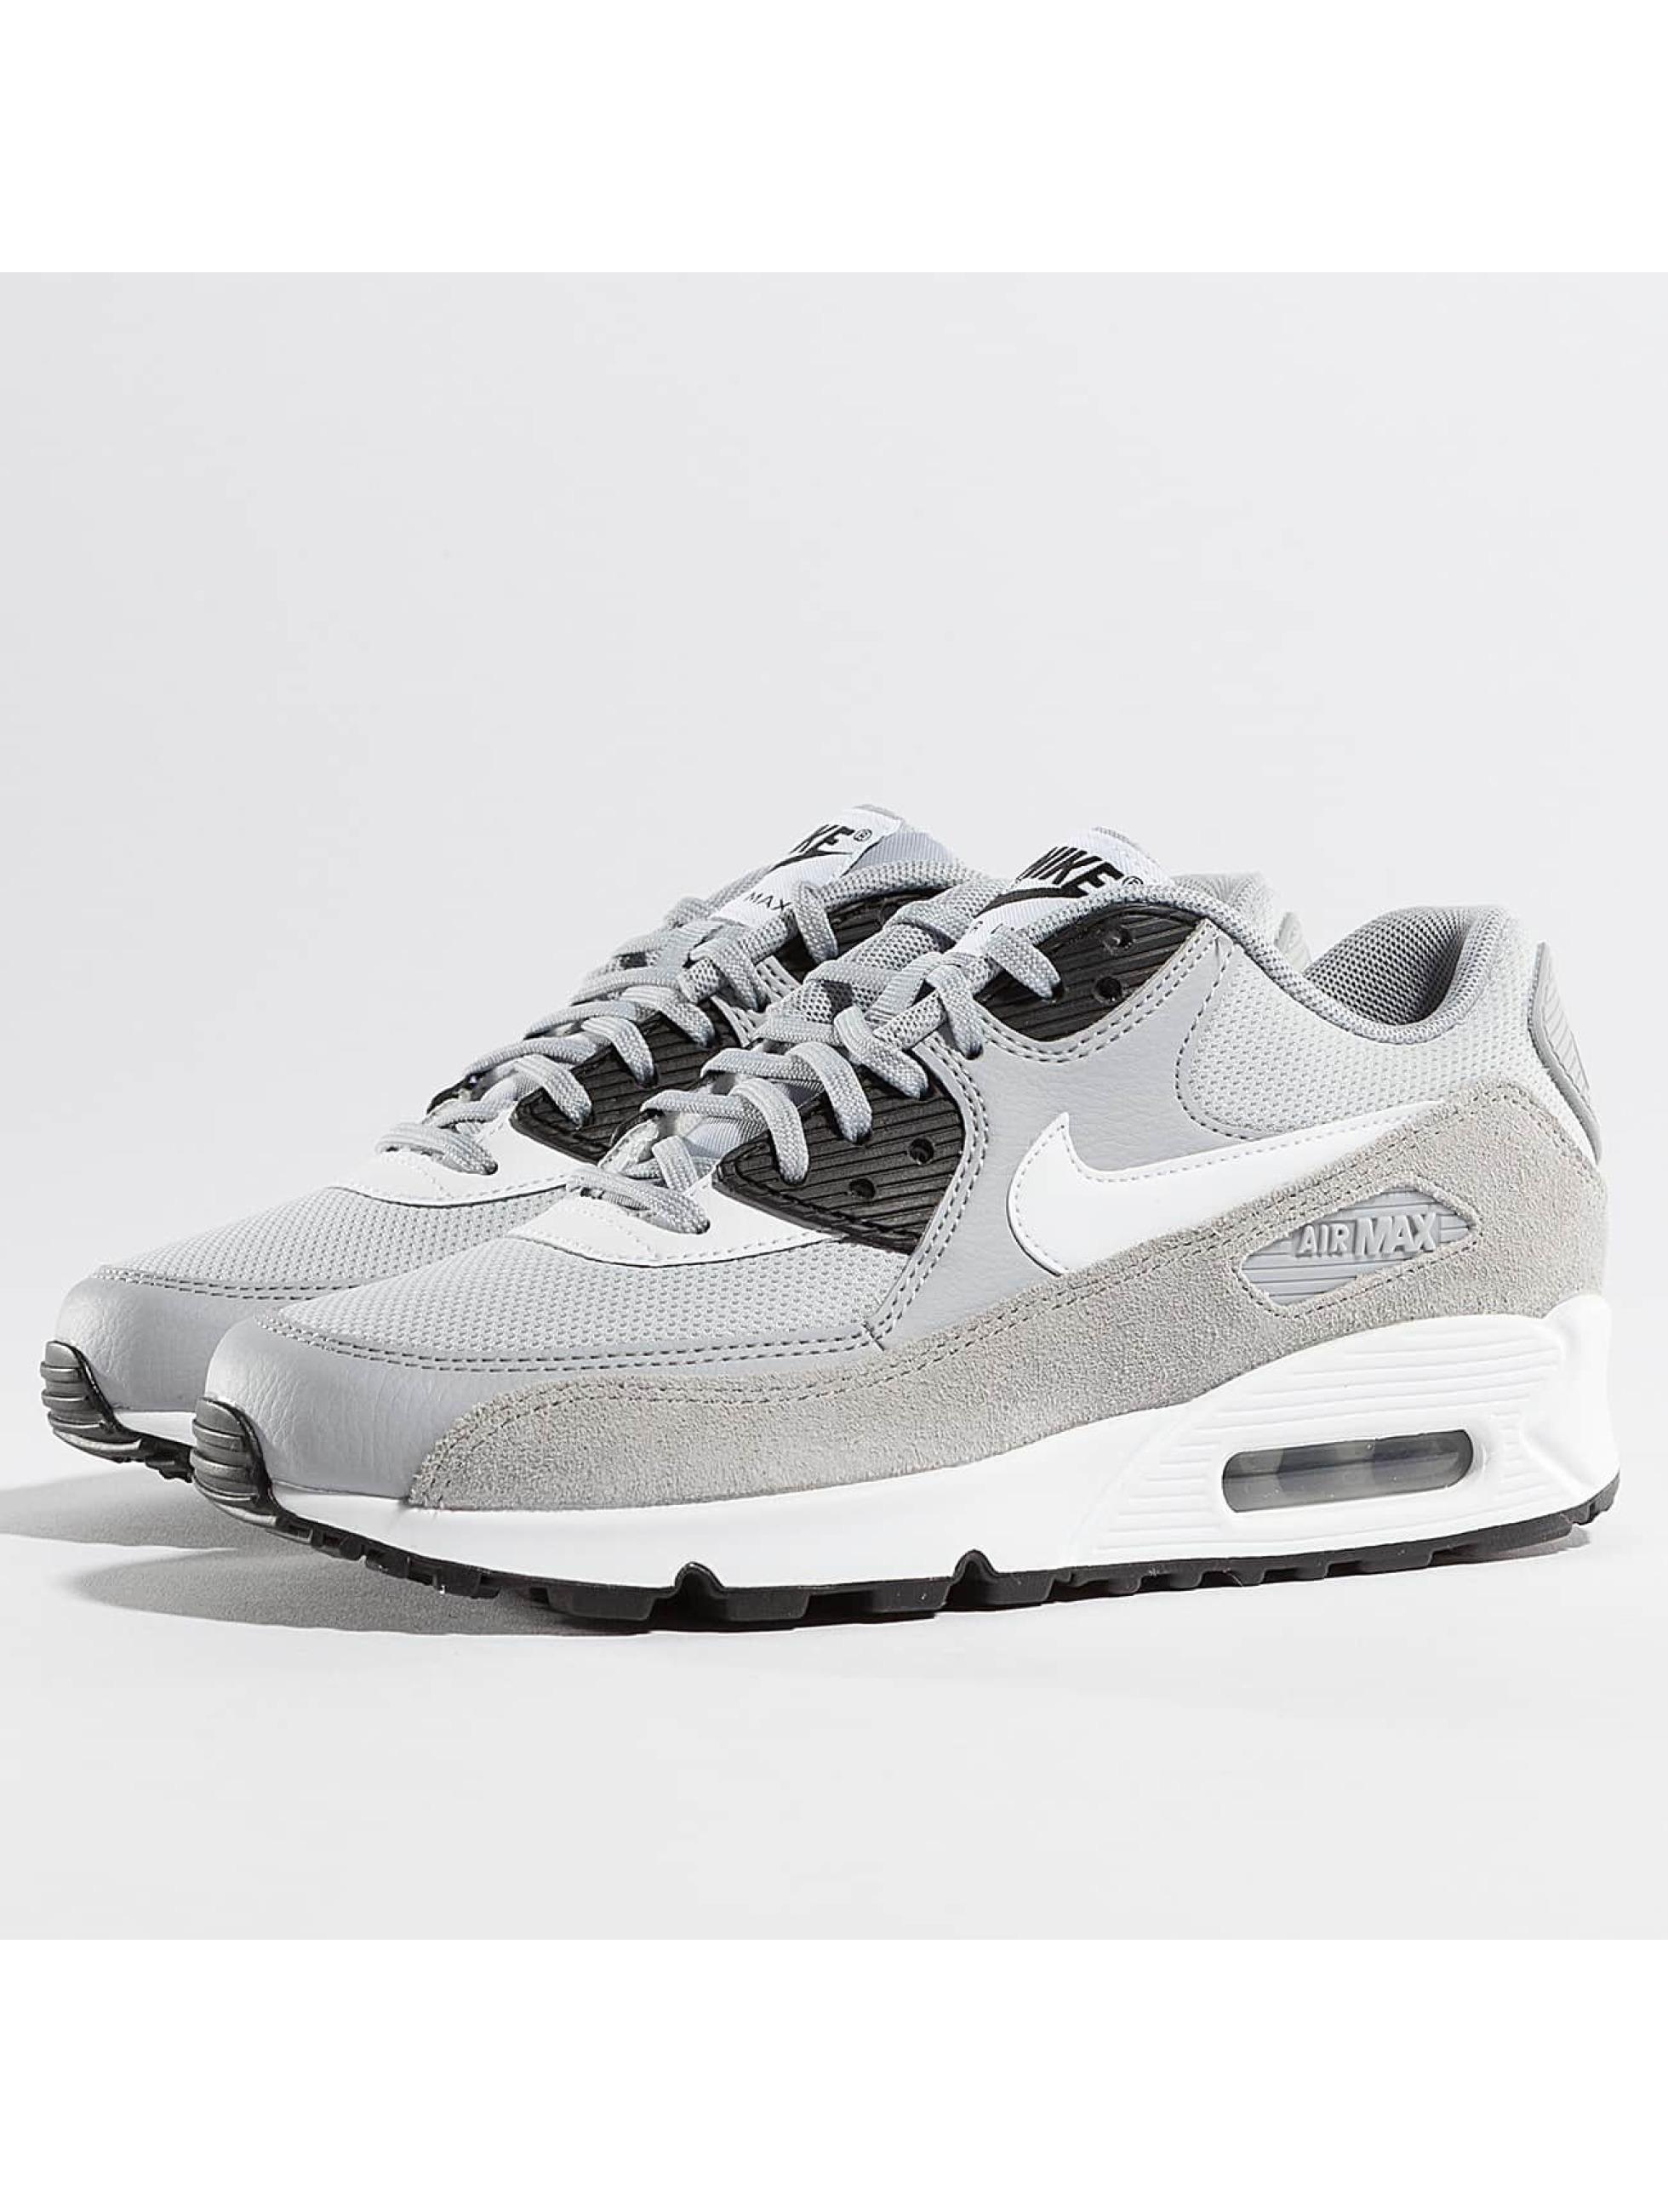 Nike Frauen Sneaker Air Max 90 in grau